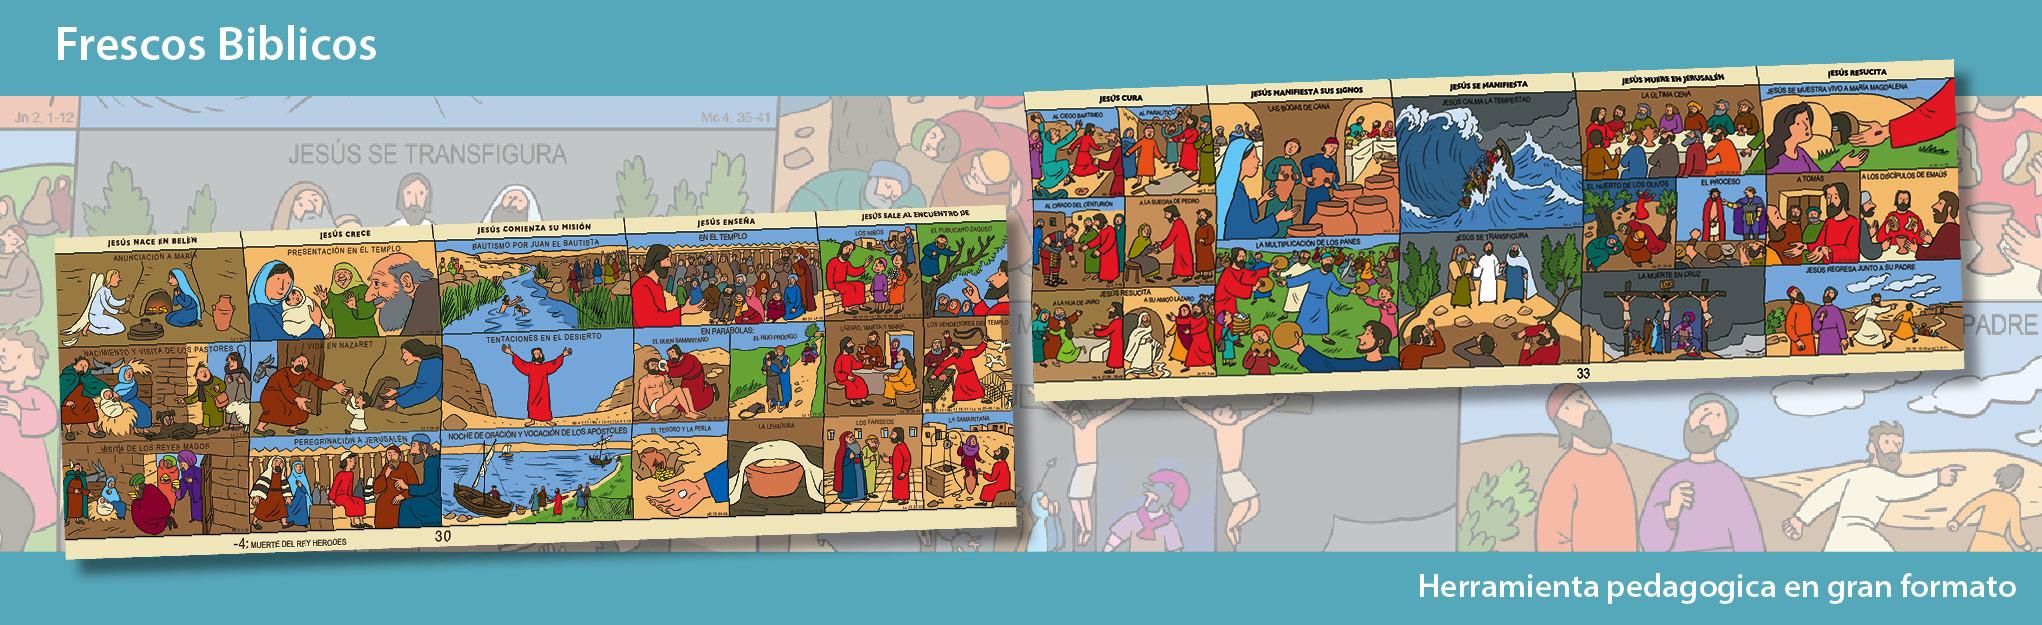 Frescos Biblicos